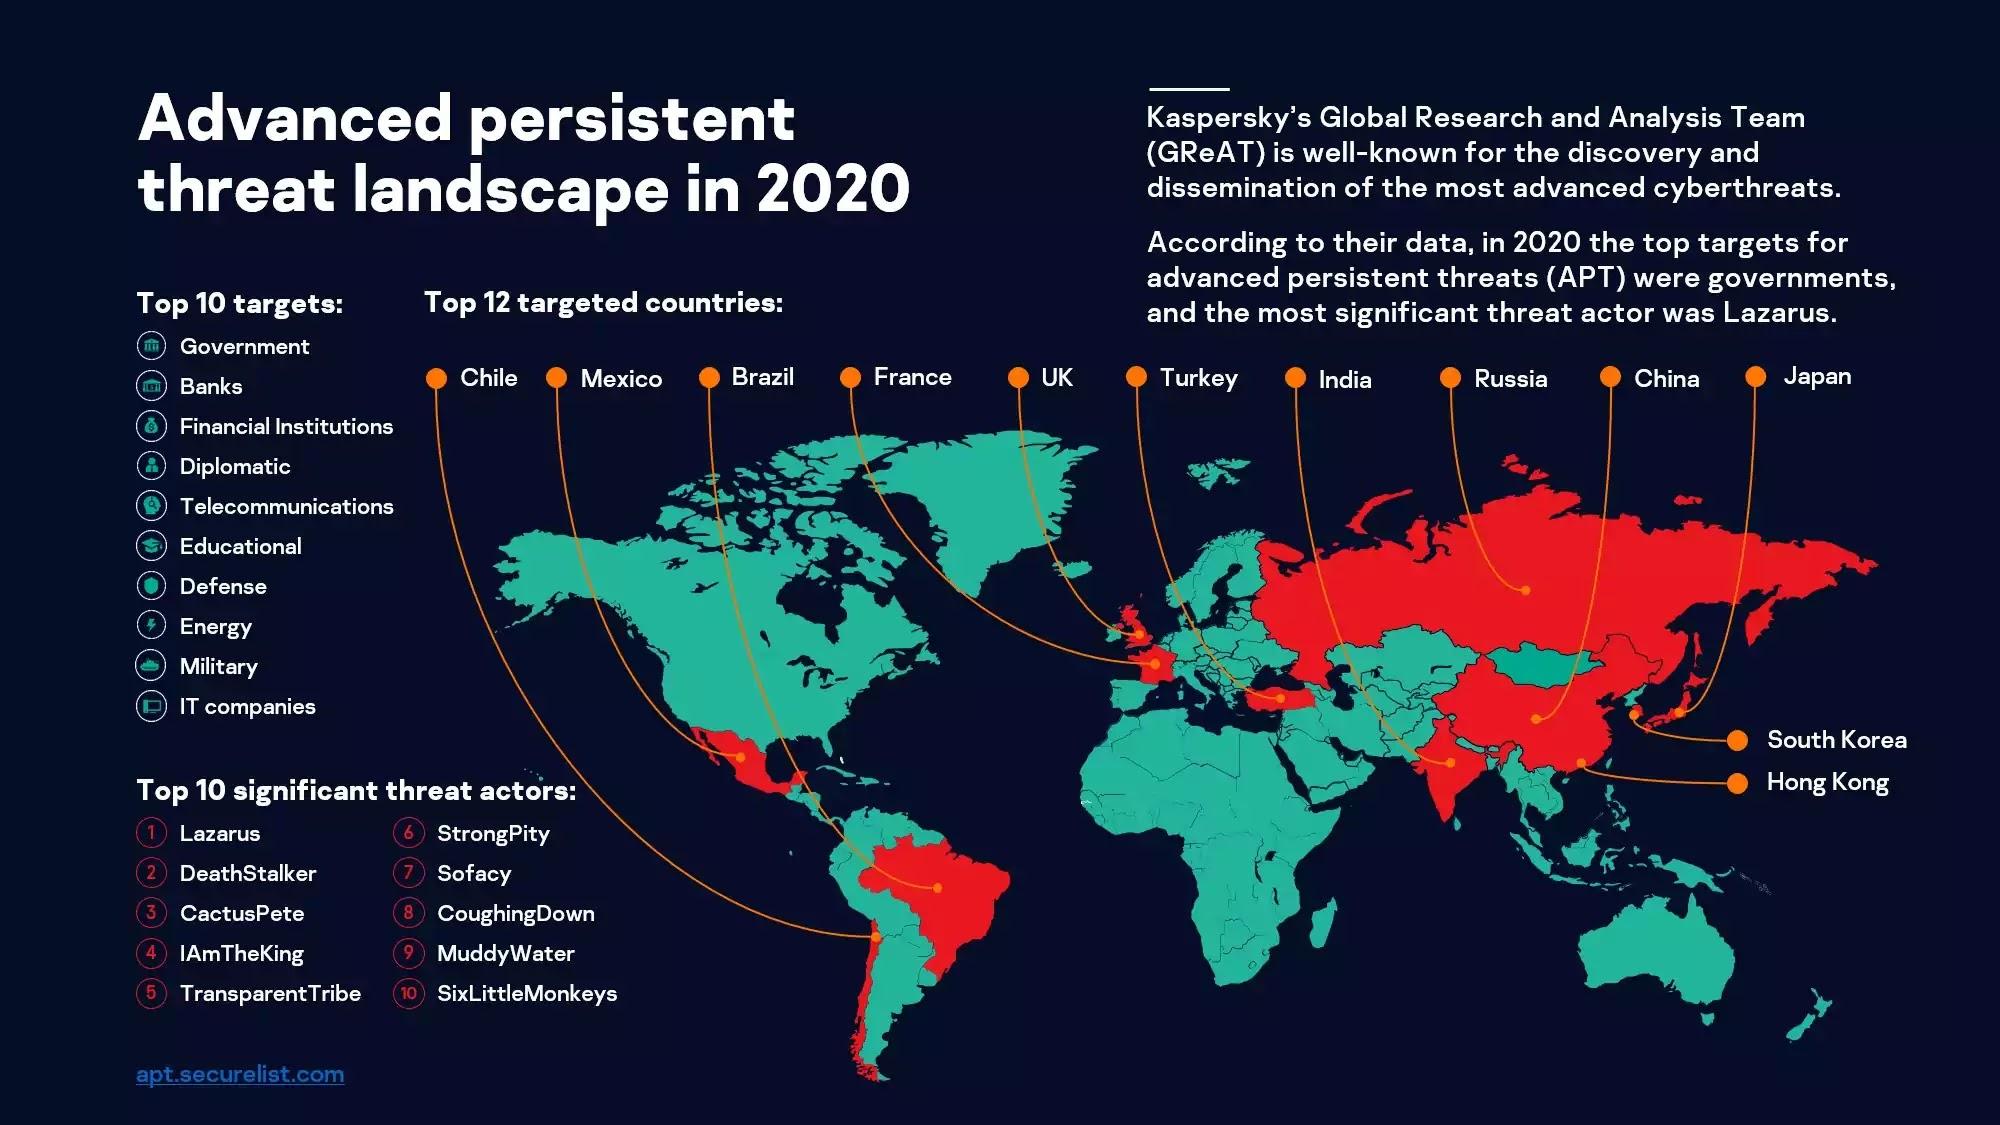 APT landscape last year according to Kaspersky's GReAT